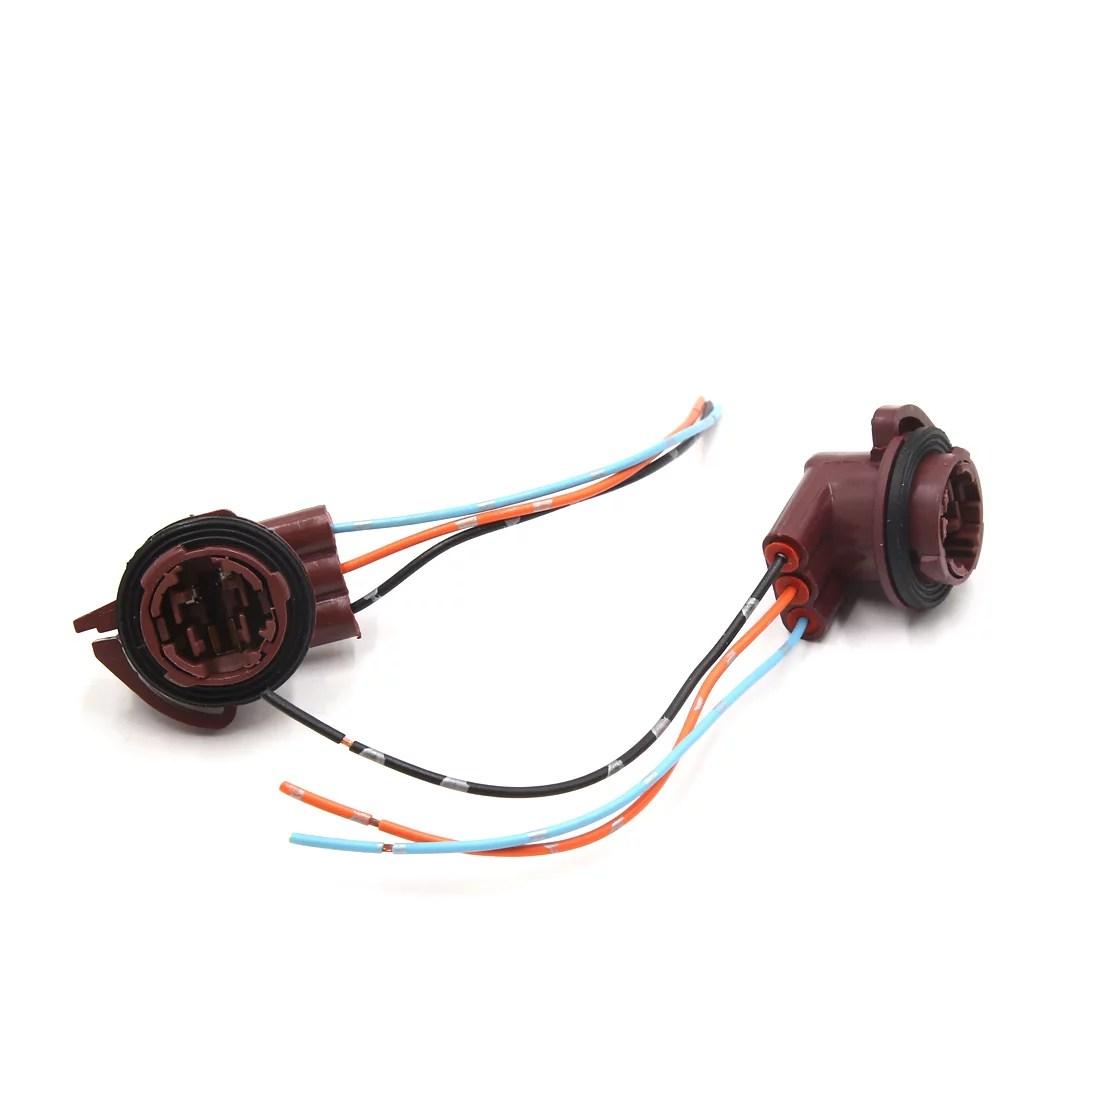 2pcs 3157 brake light bulb extension wiring harness socket connector for car walmart canada [ 1100 x 1100 Pixel ]